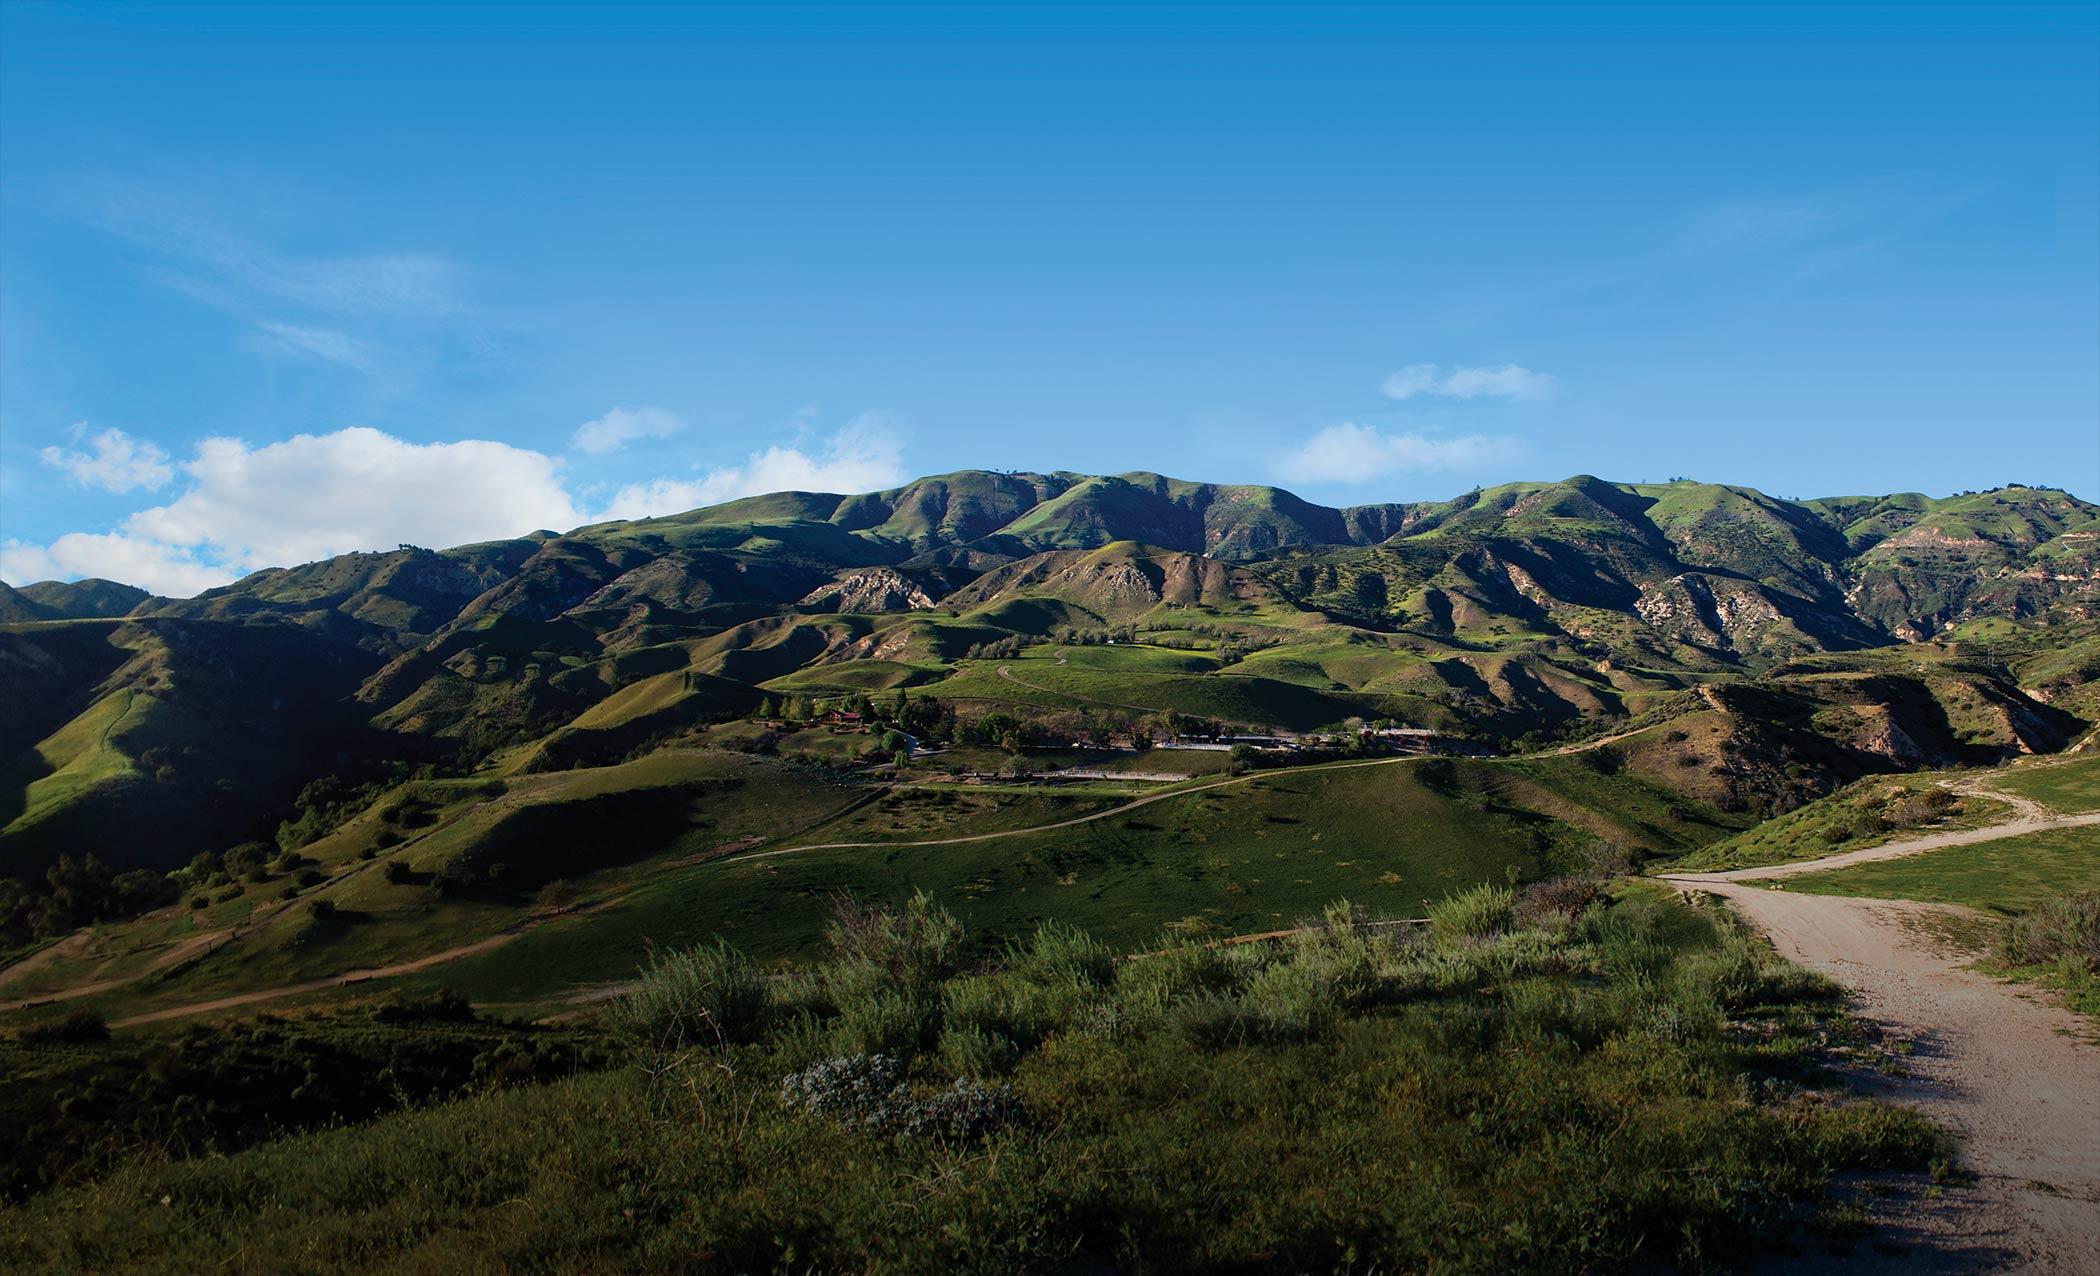 California Hills at Daytime